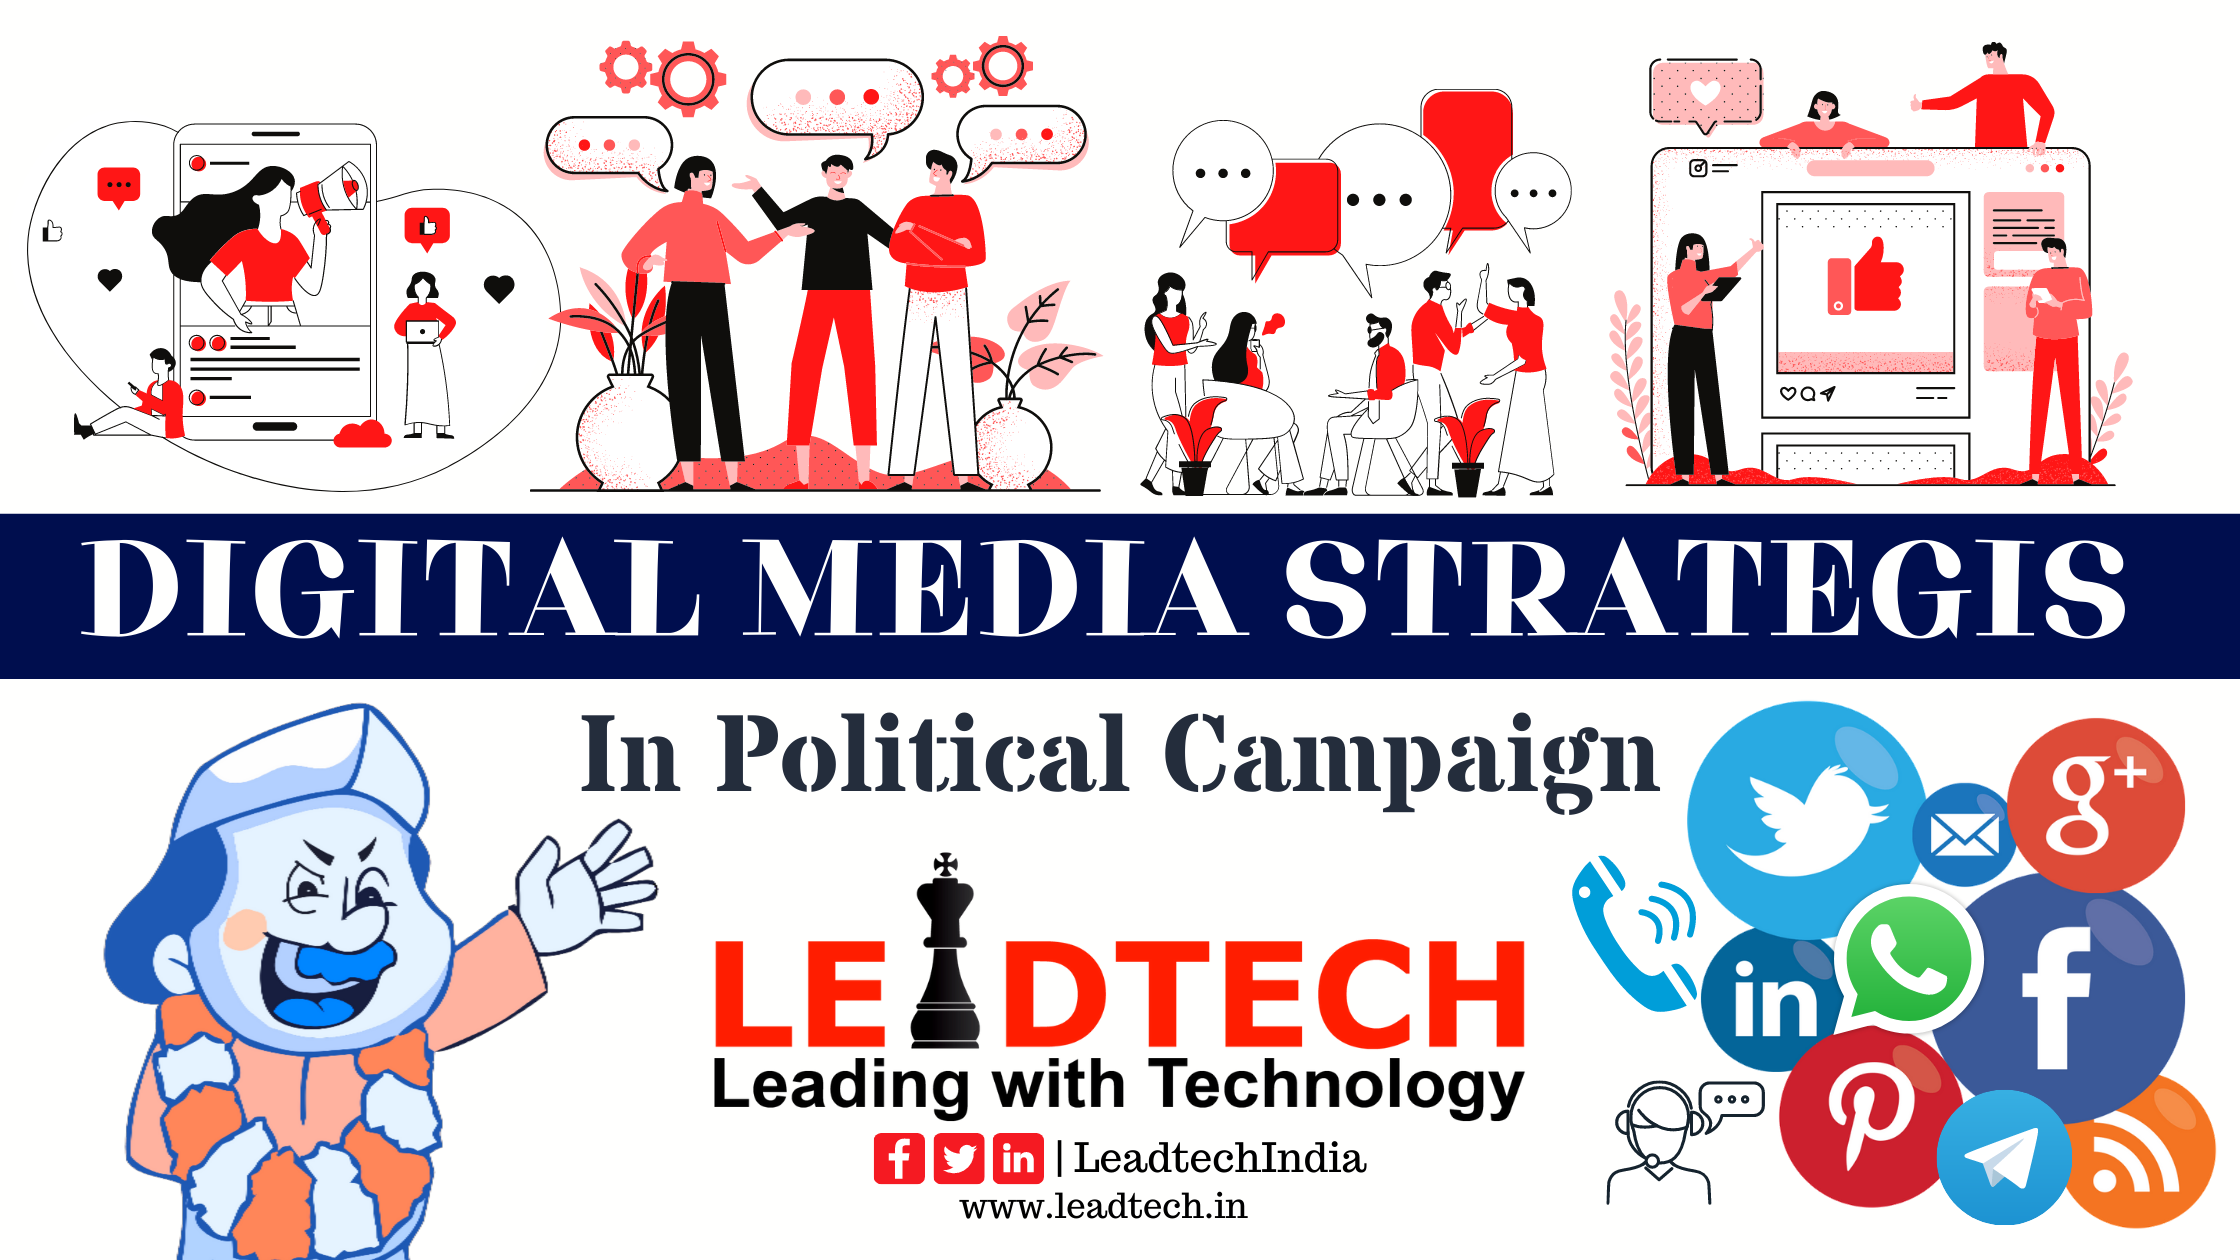 Digital Media Strategies in Political Campaign